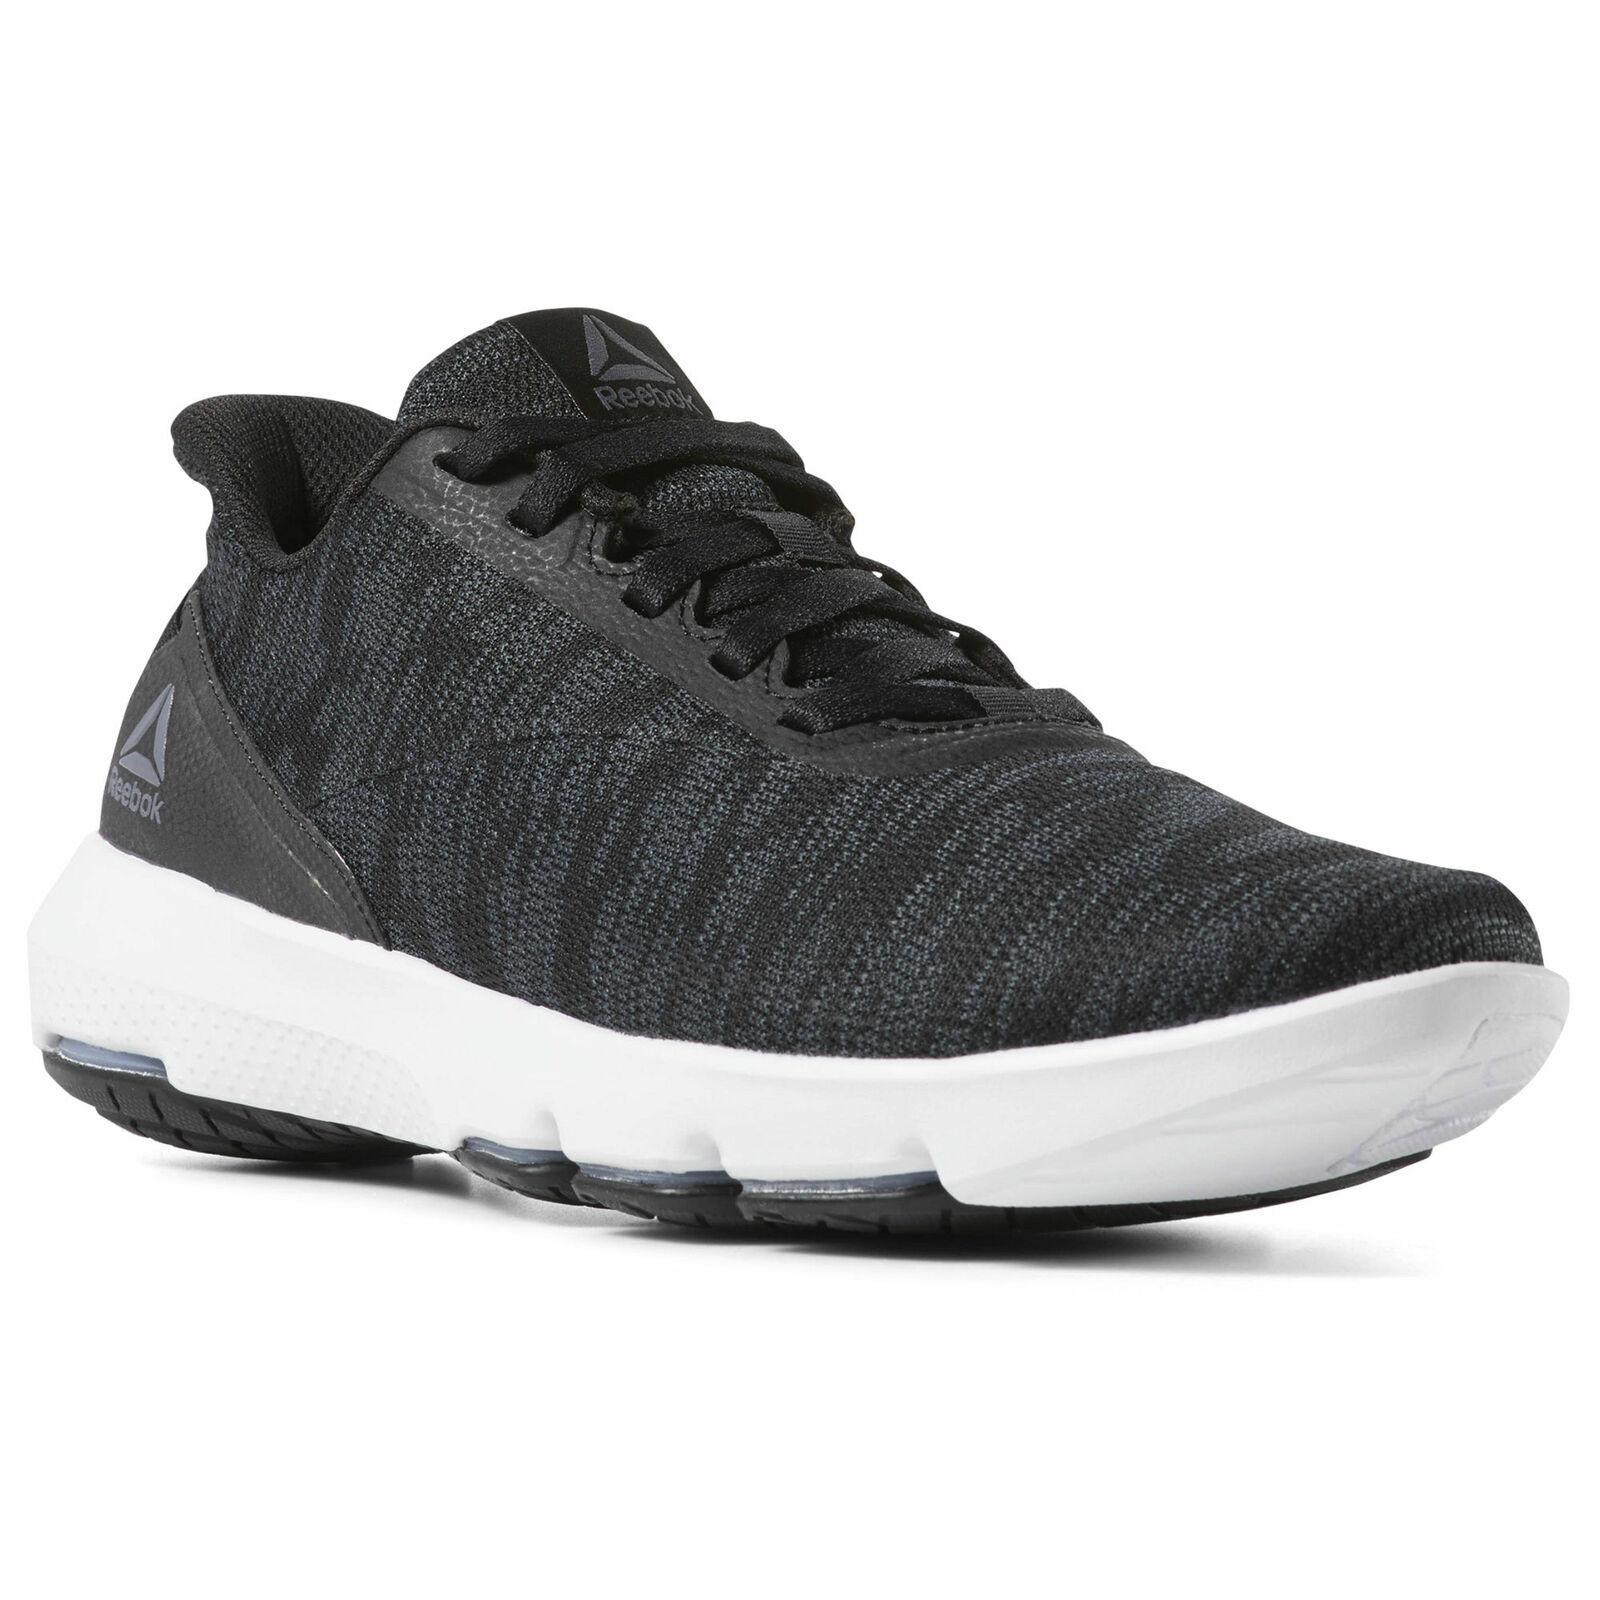 Reebok: Men's Cloudride DMX 4 Walking Shoes $35 Shipped